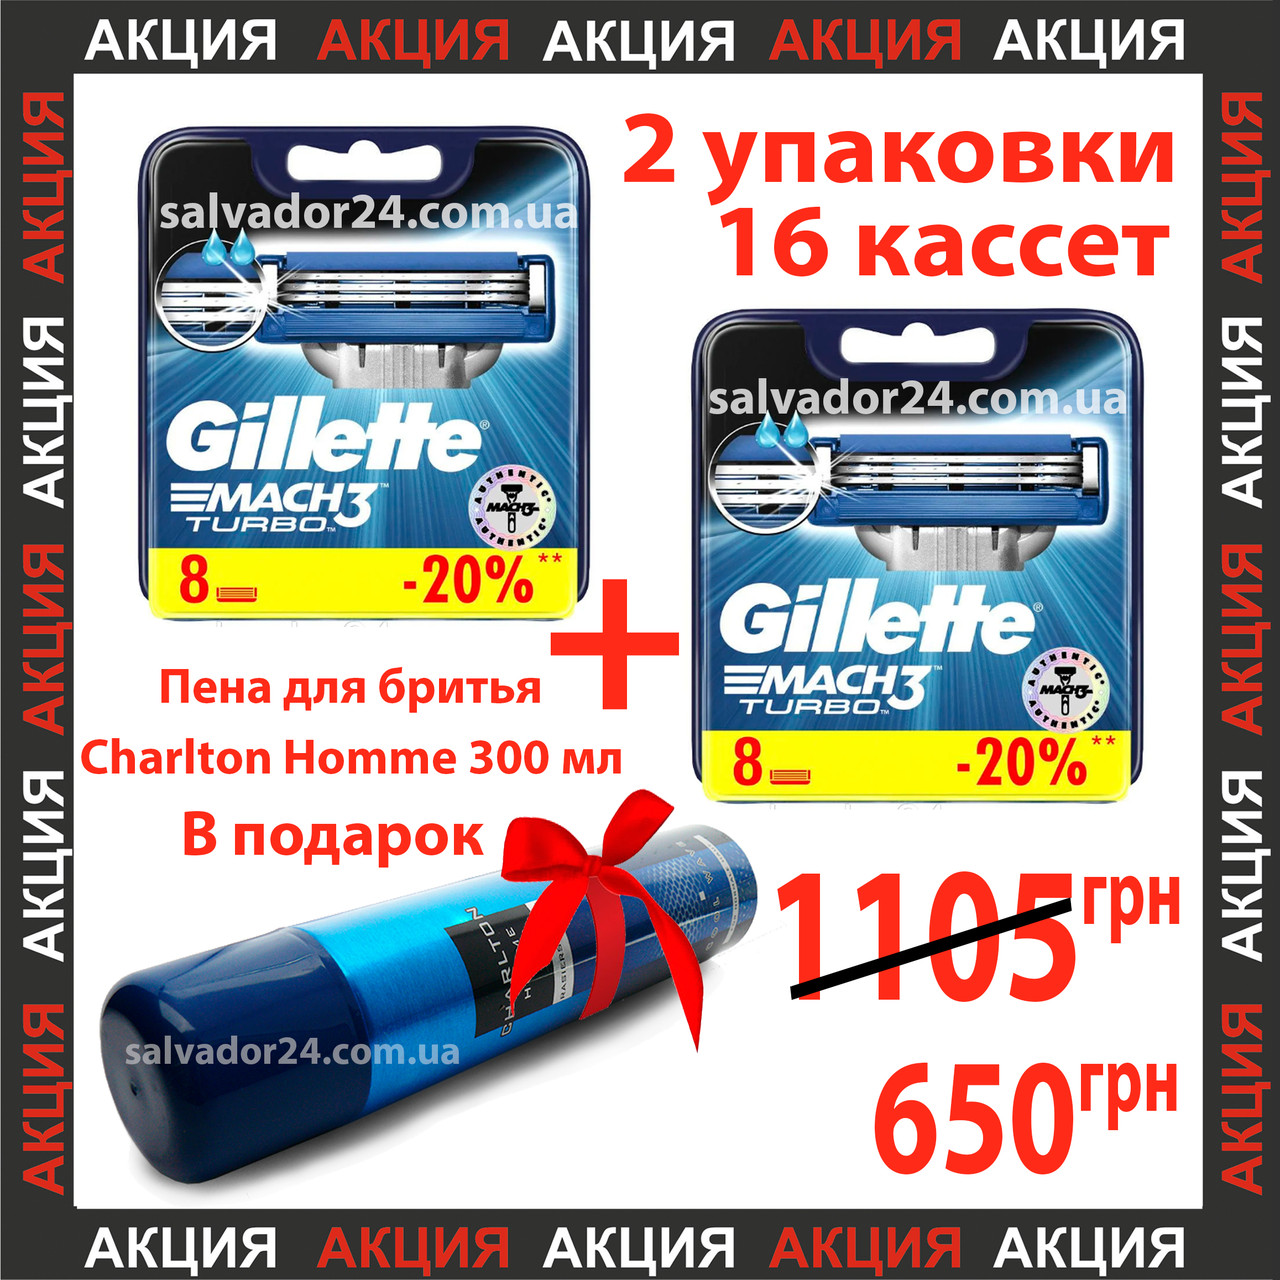 Gillette Mach3 Turbo 16 шт. в упаковке, новый тип картриджа + пена для бритья Charlton Homme 300 мл